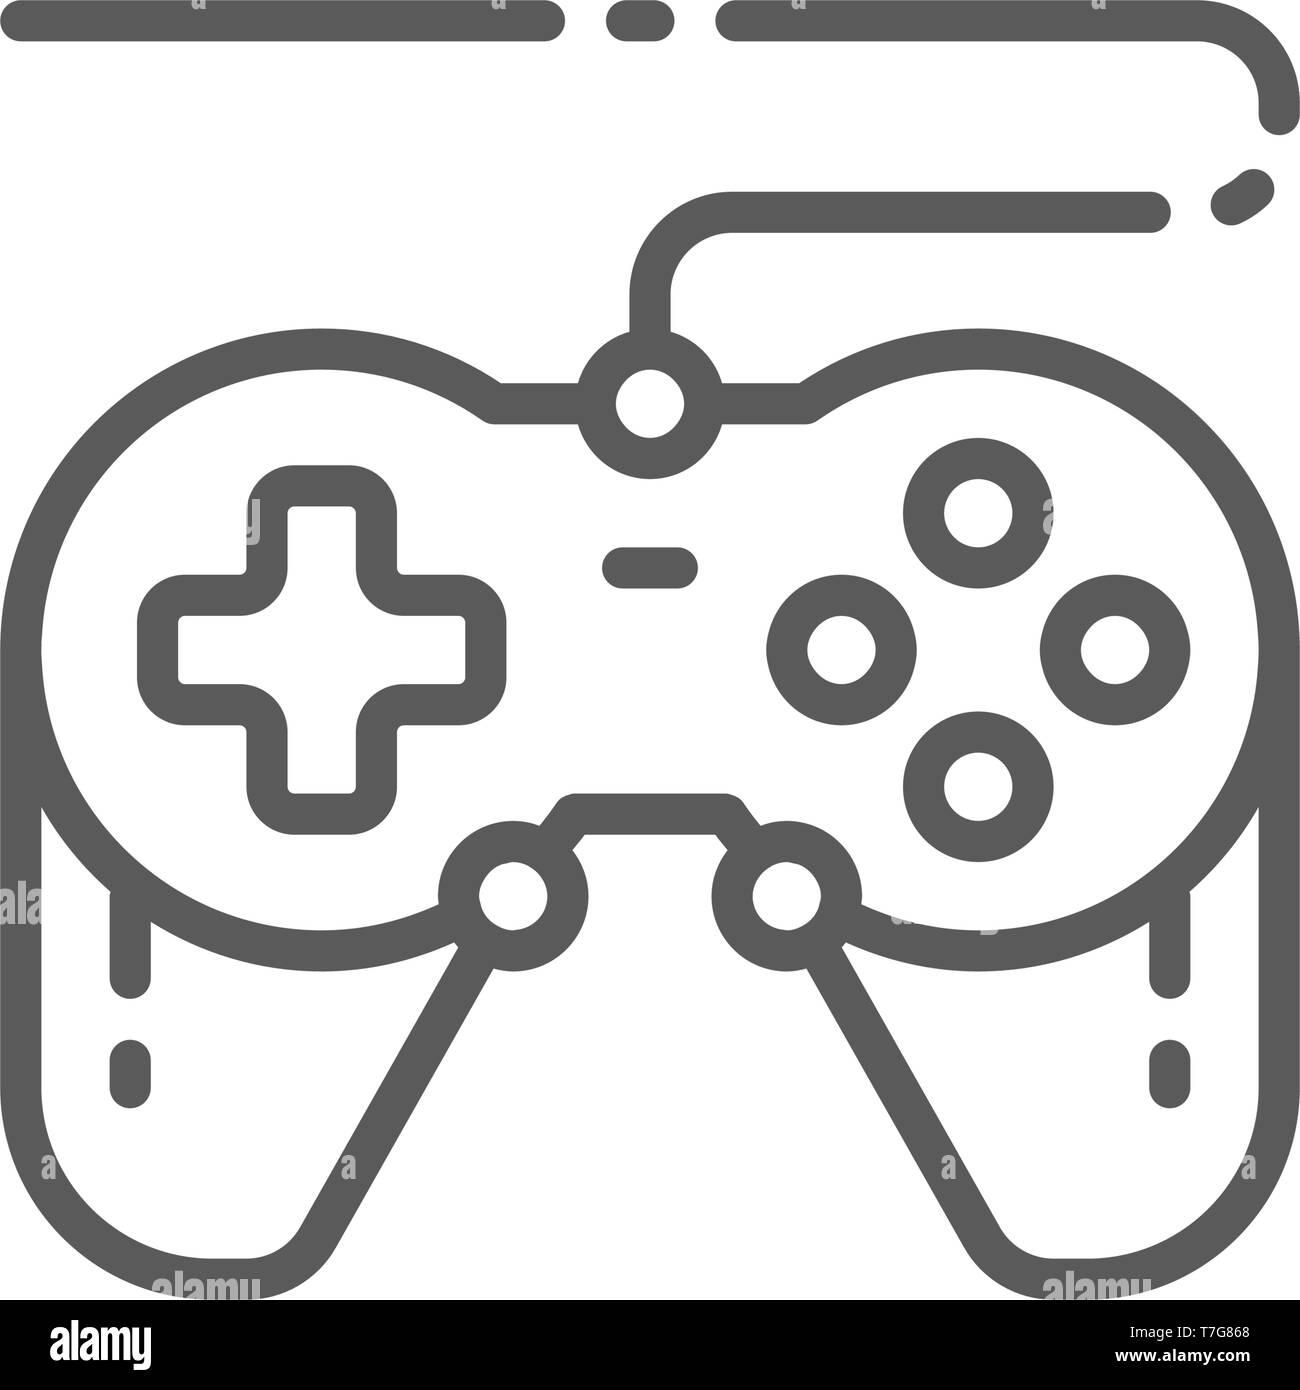 Joystick, gamepad, gaming device line icon. - Stock Image